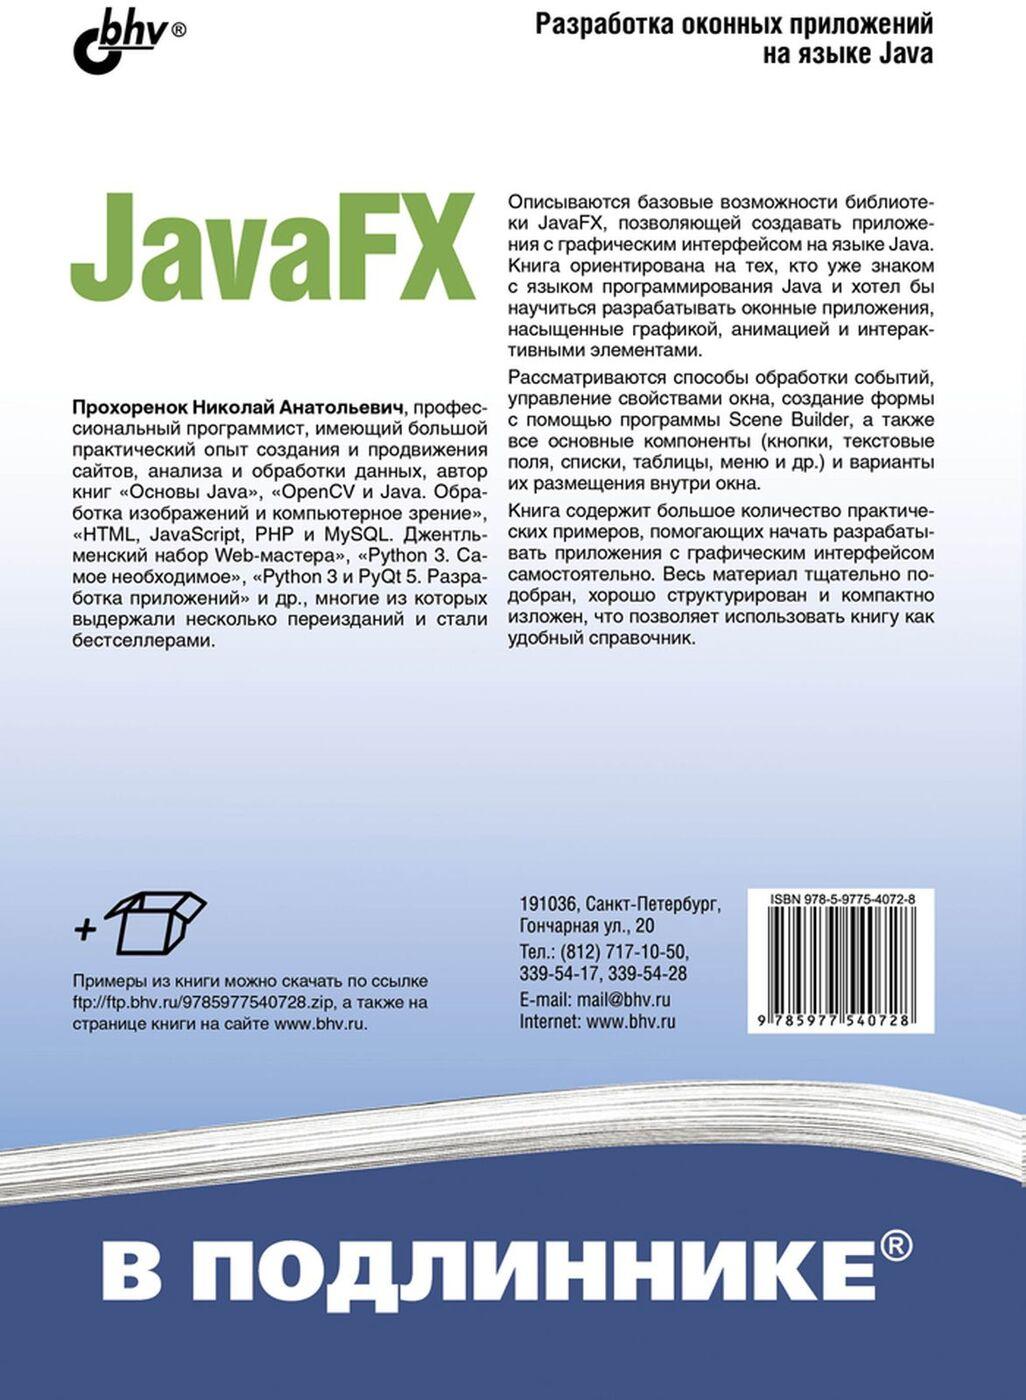 Николай Прохоренок. JavaFX